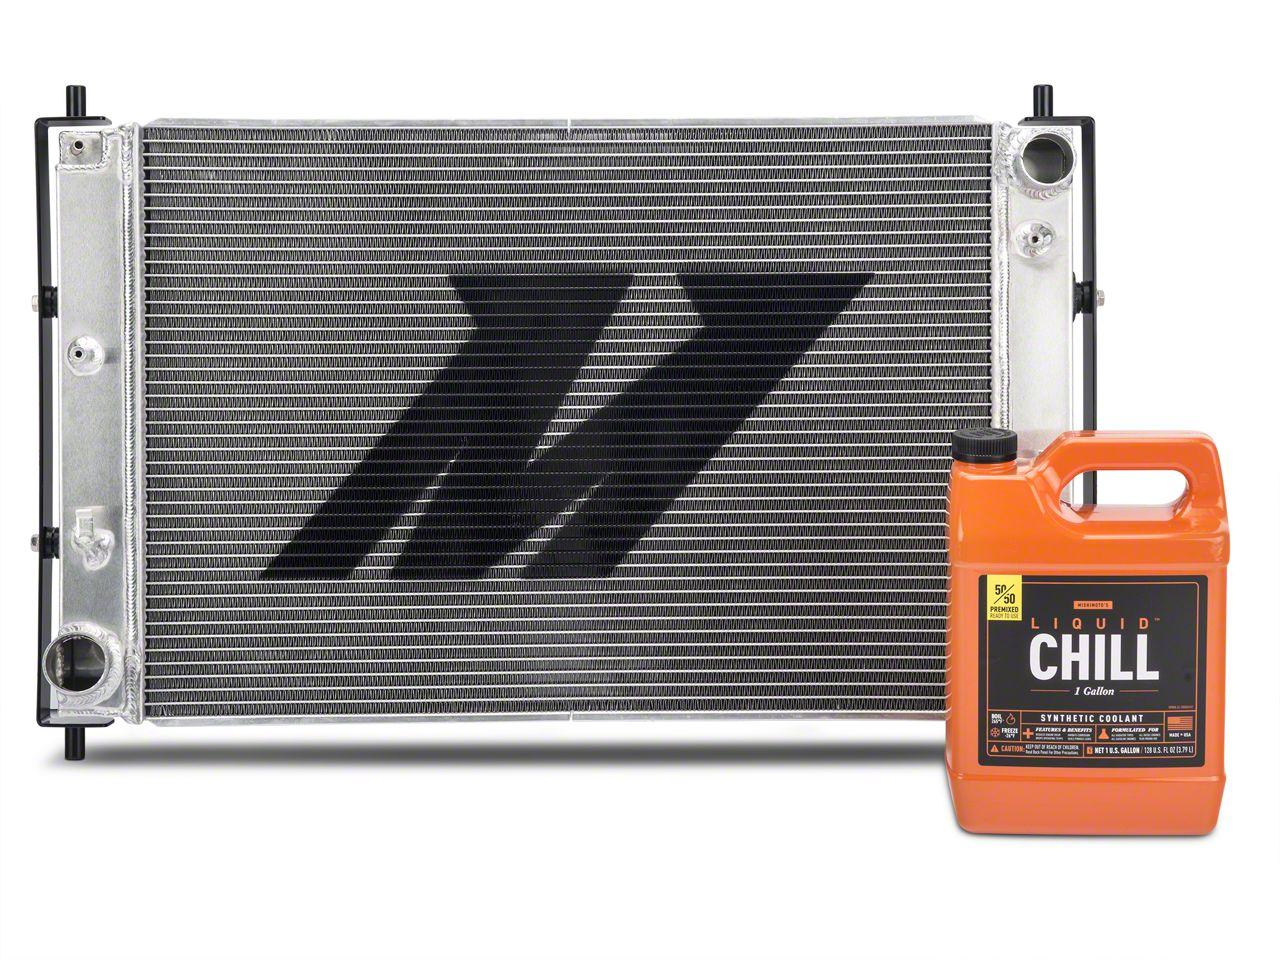 Mishimoto Aluminum Radiator w/ Liquid Chill Pre-Mix Coolant (97-04 V8 w/ Manual Transmission, Excluding 03-04 Cobra)